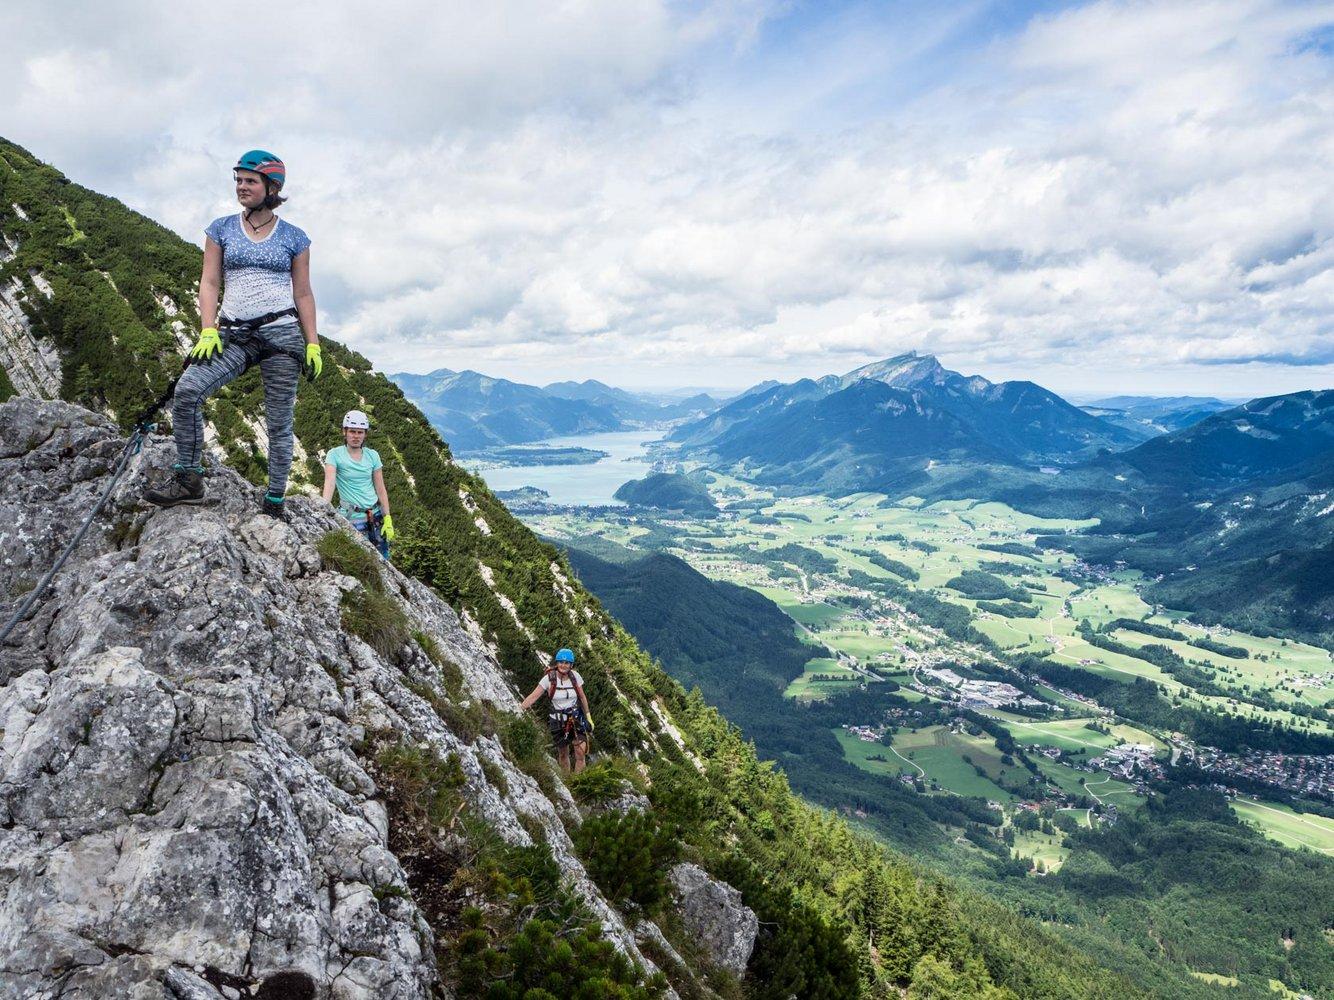 Klettersteig Katrin : Katrin klettersteig bergsteigen.com